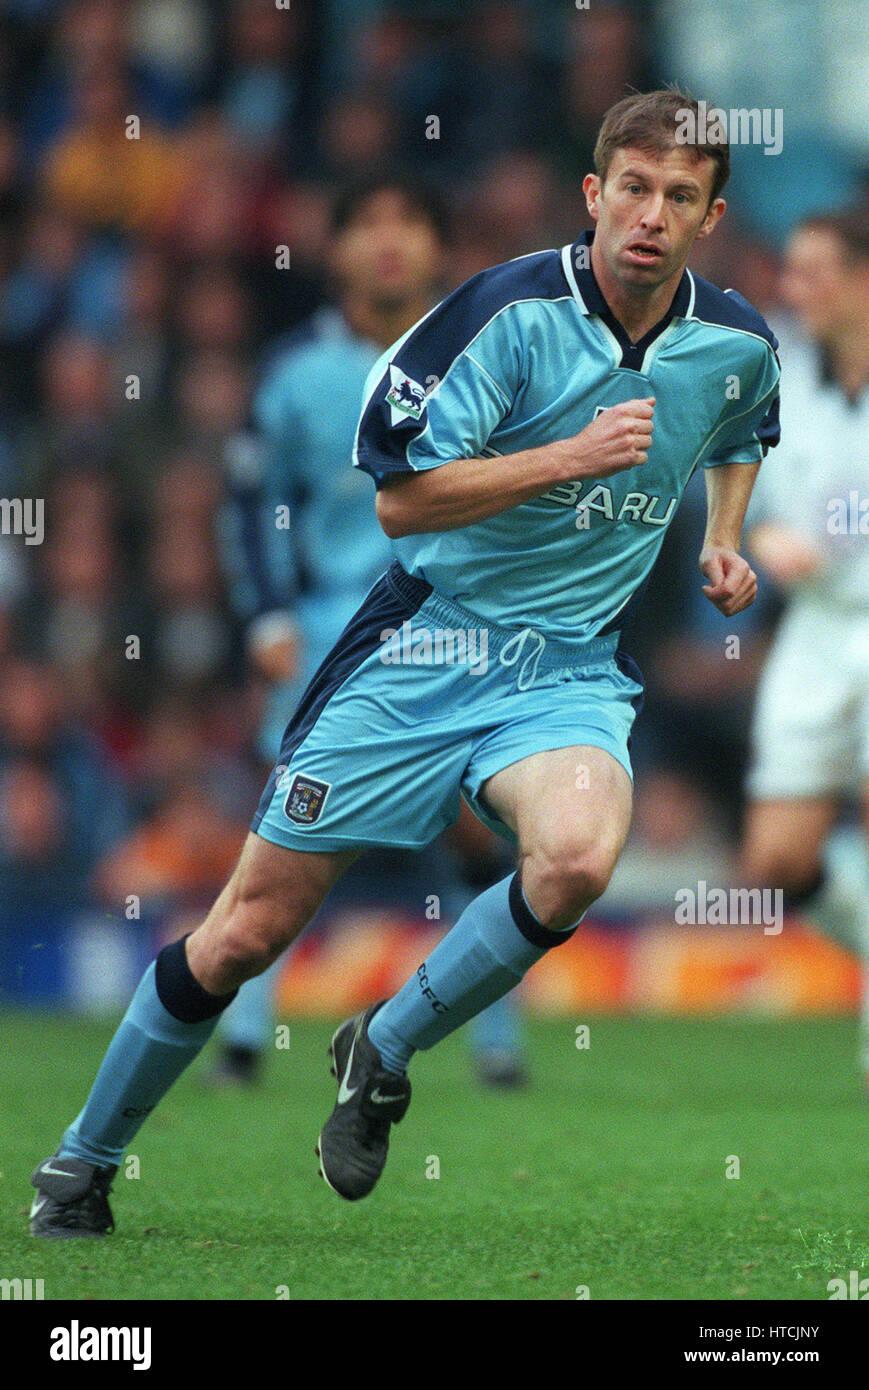 STEPHEN FROGGATT COVENTRY CITY FC 16 October 1999 - Stock Image